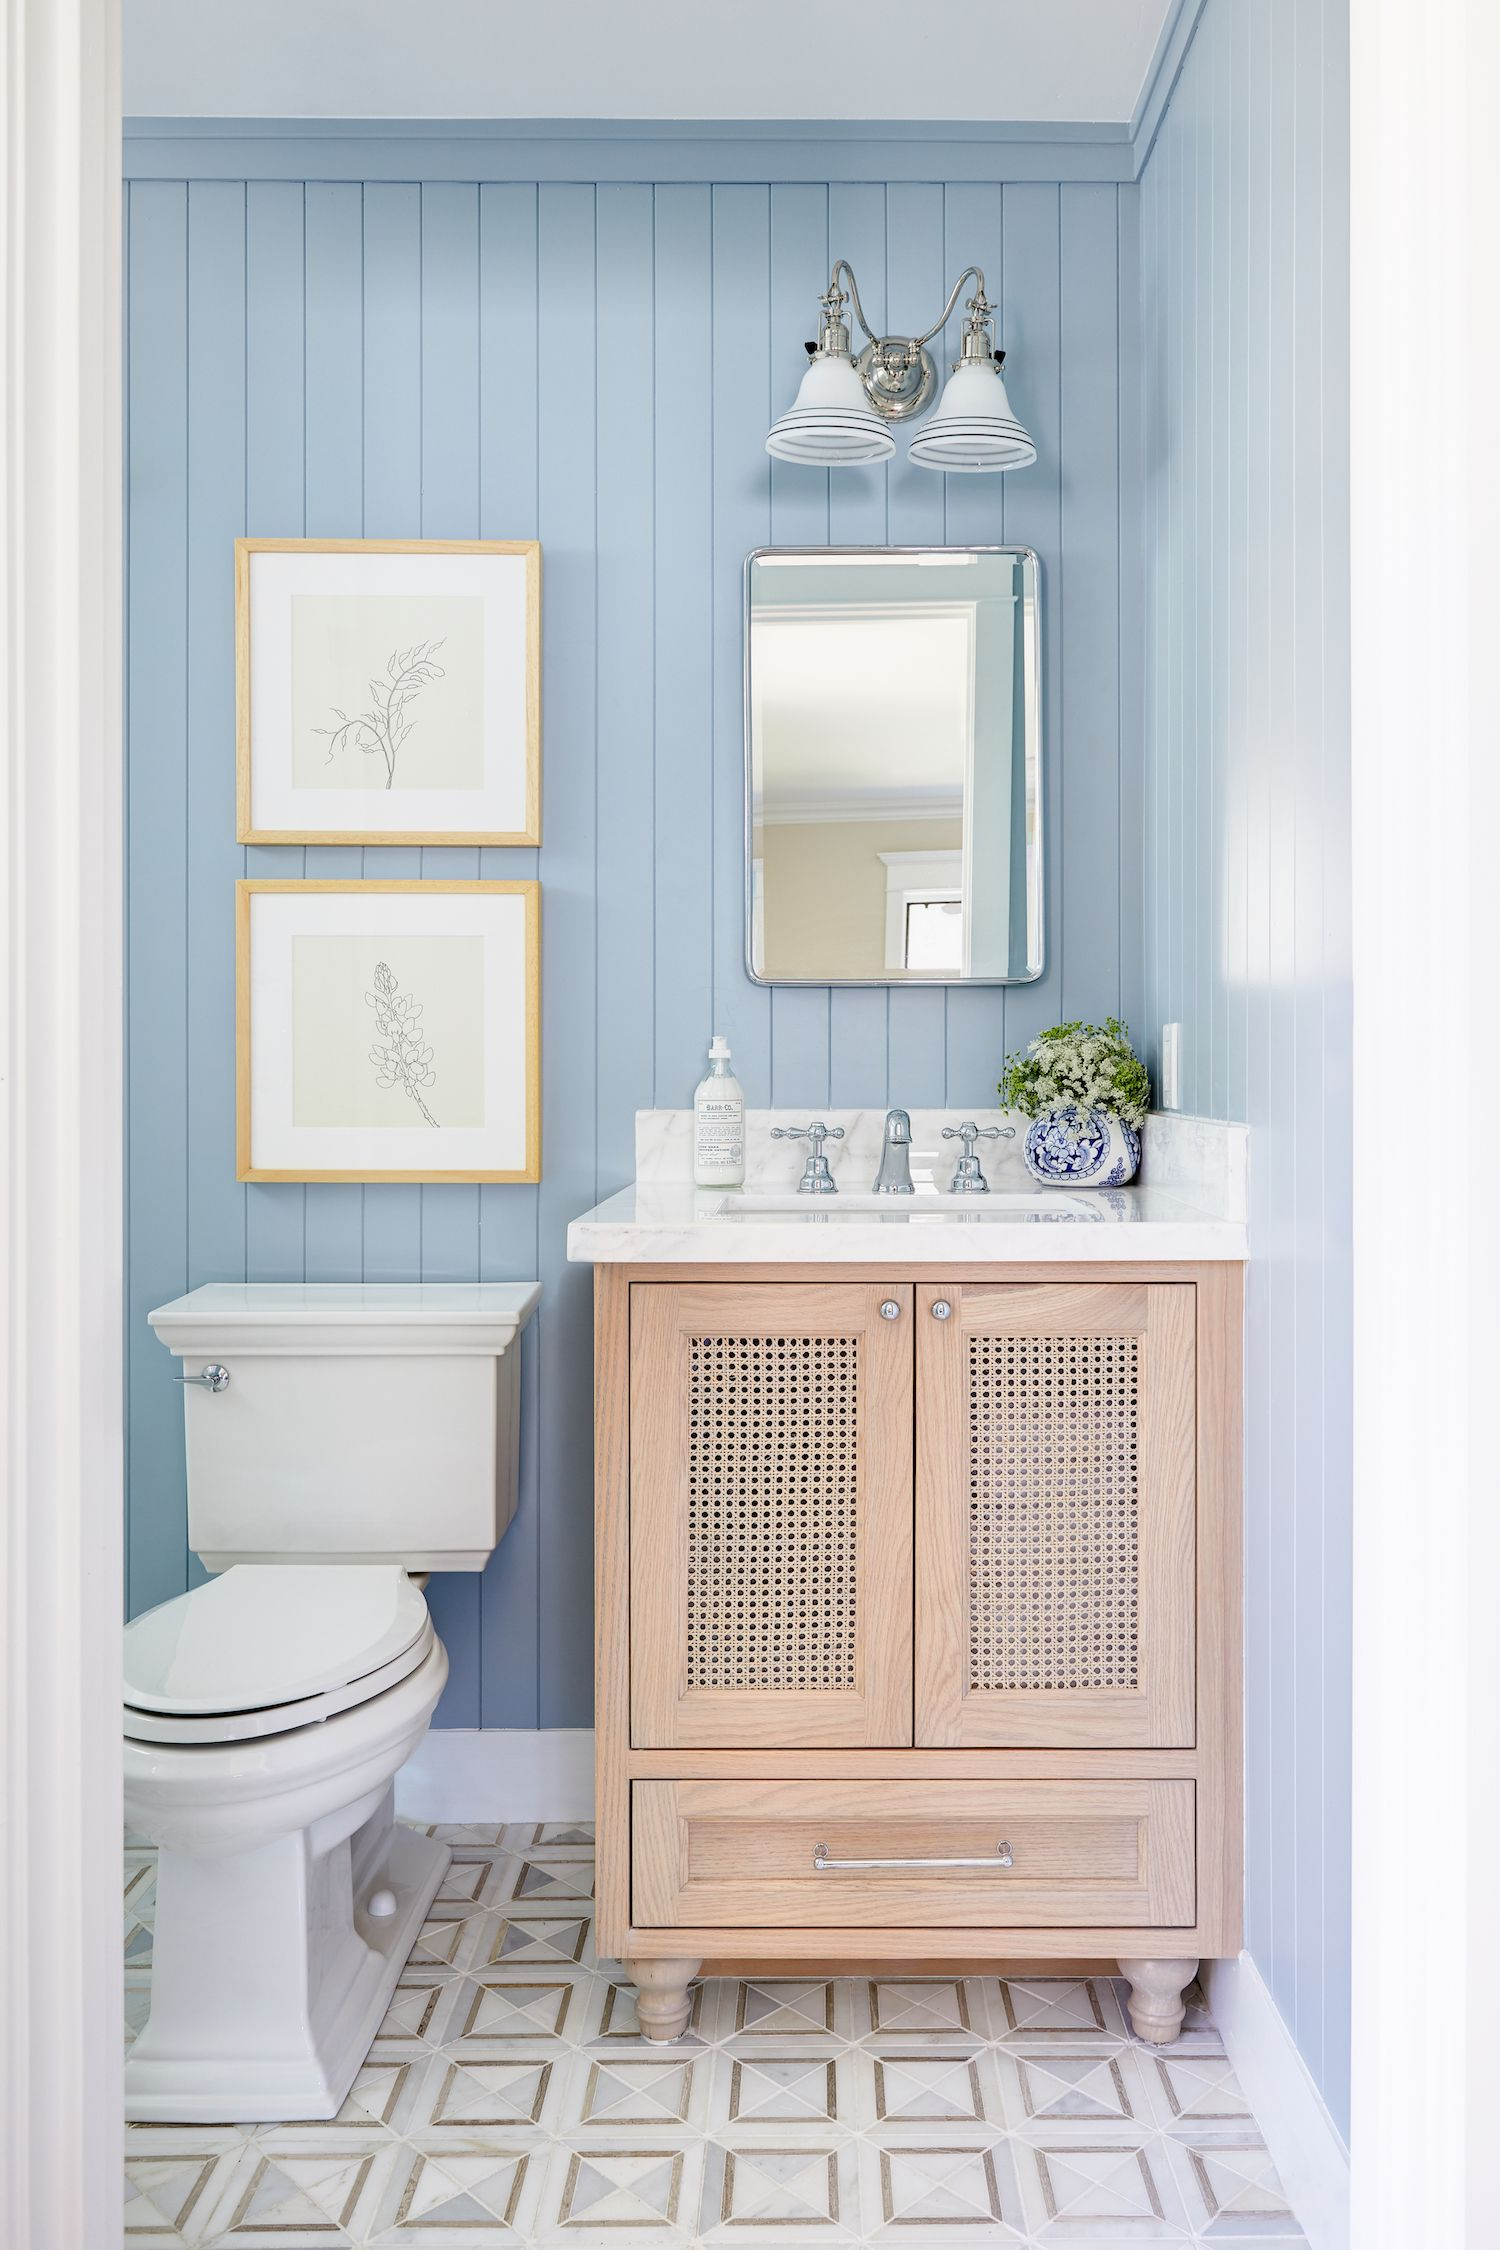 Light Blue Bathroom By Phoenix Interior Designer Lexi Westergard Design The Identite Collective Clien Light Blue Bathroom Blue Bathroom Modern White Bathroom